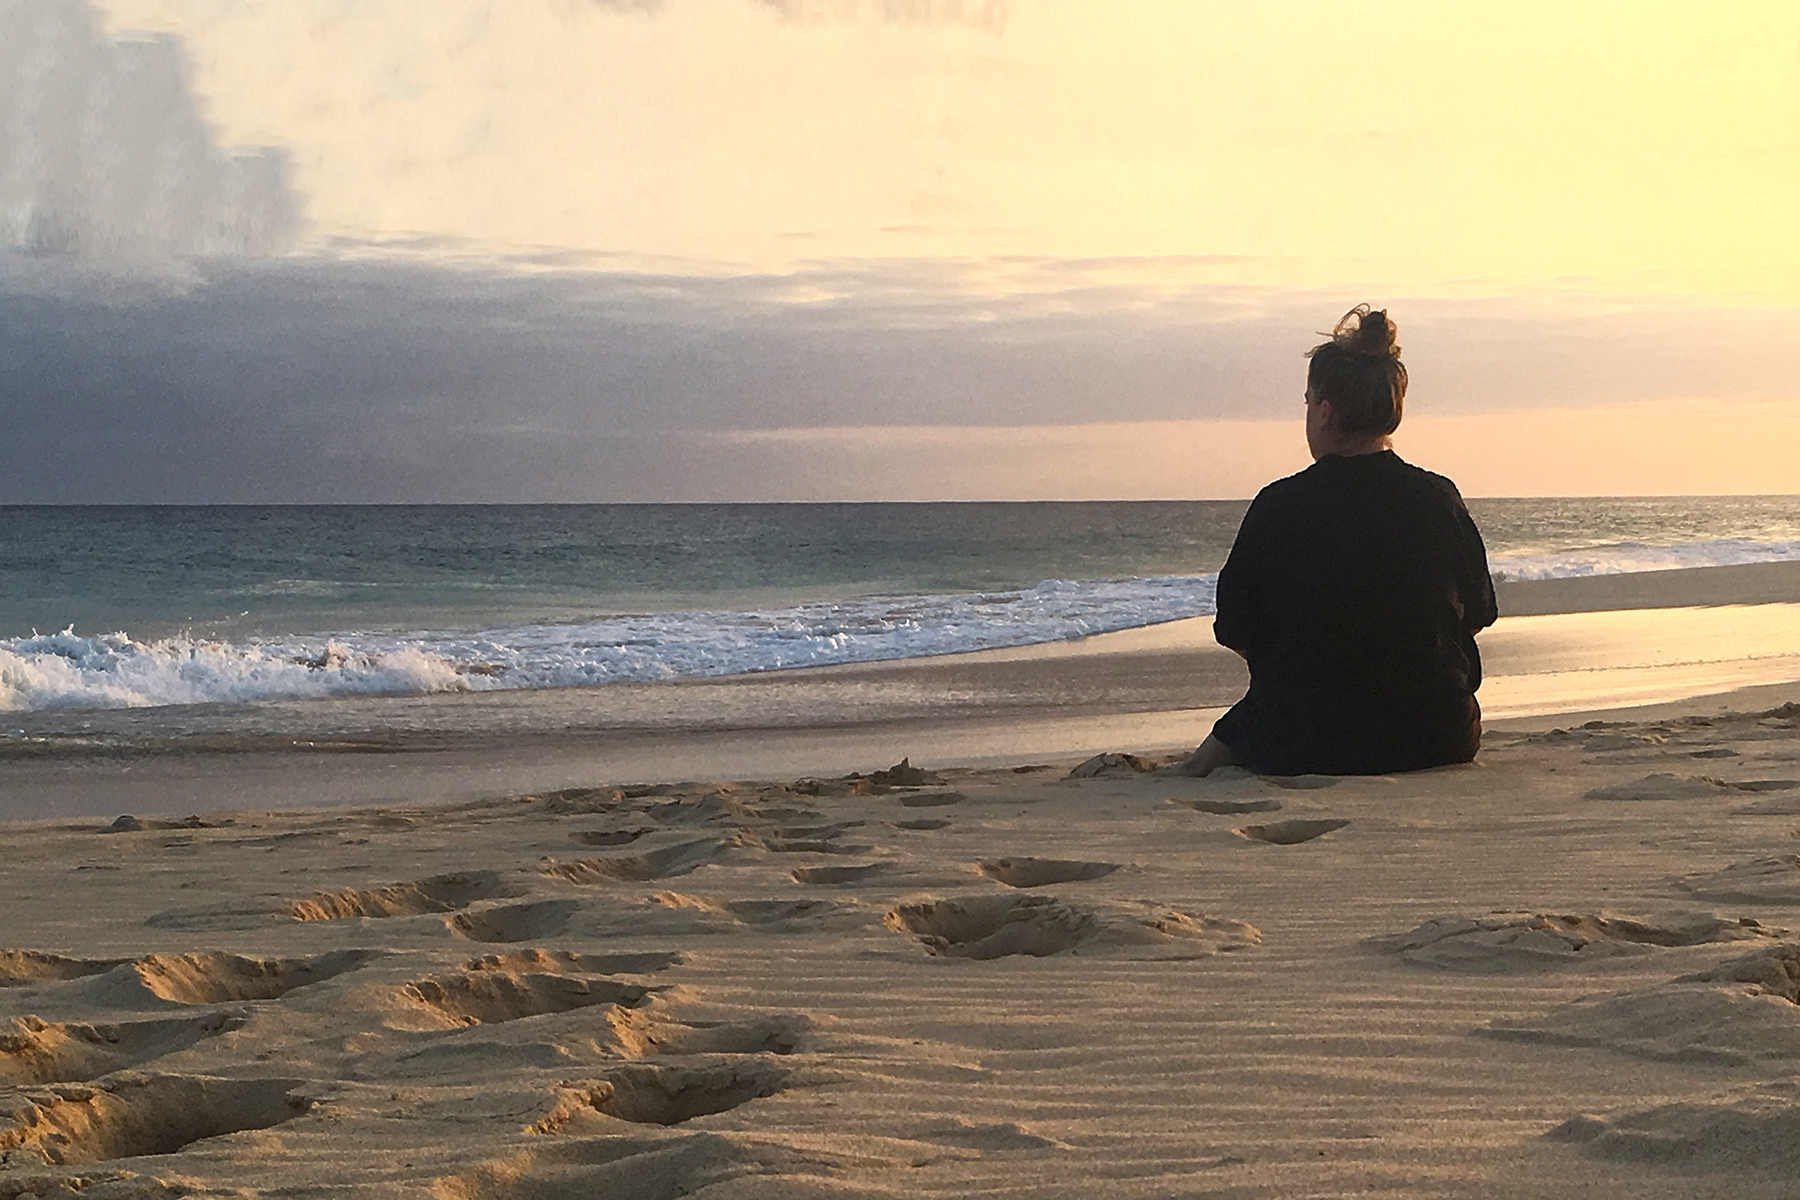 Reisevorsätze 2019: 8 Ideen, um 2019 noch bewusster und besser zu reisen